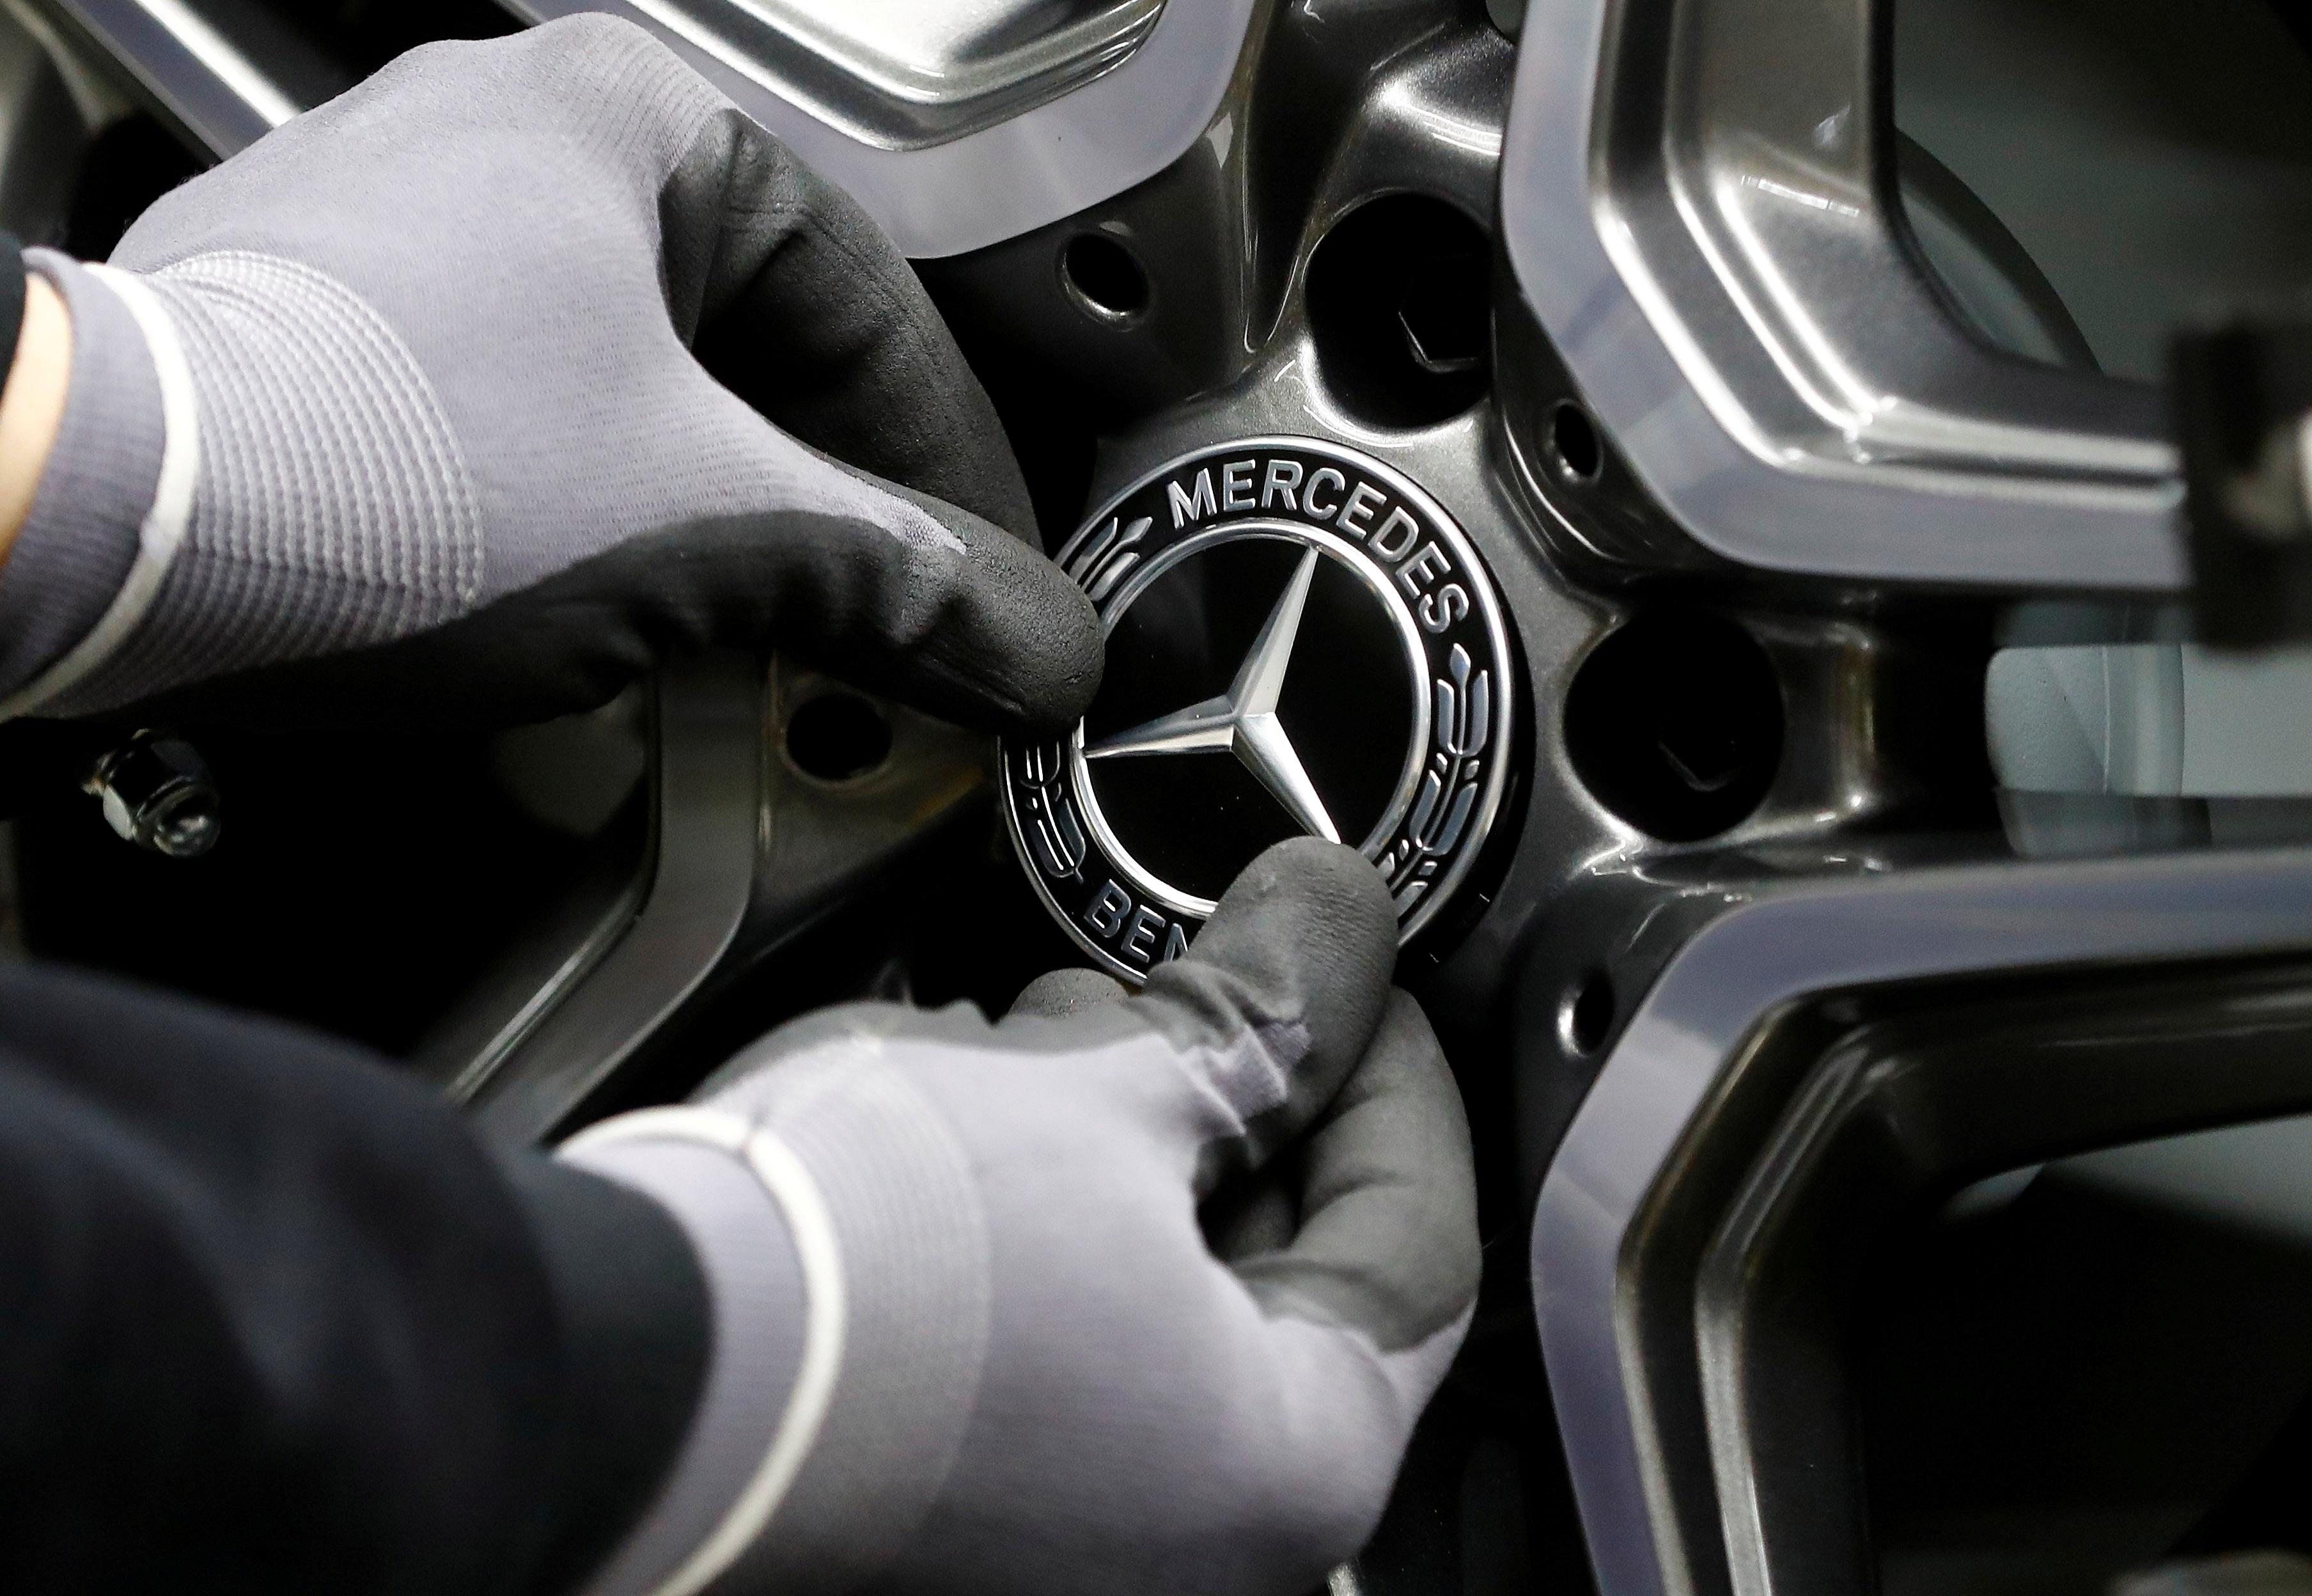 Daimler: Απολύσεις προσωπικού στη Mercedes Benz για εξοικονόμηση 1 δισεκ. ευρώ!